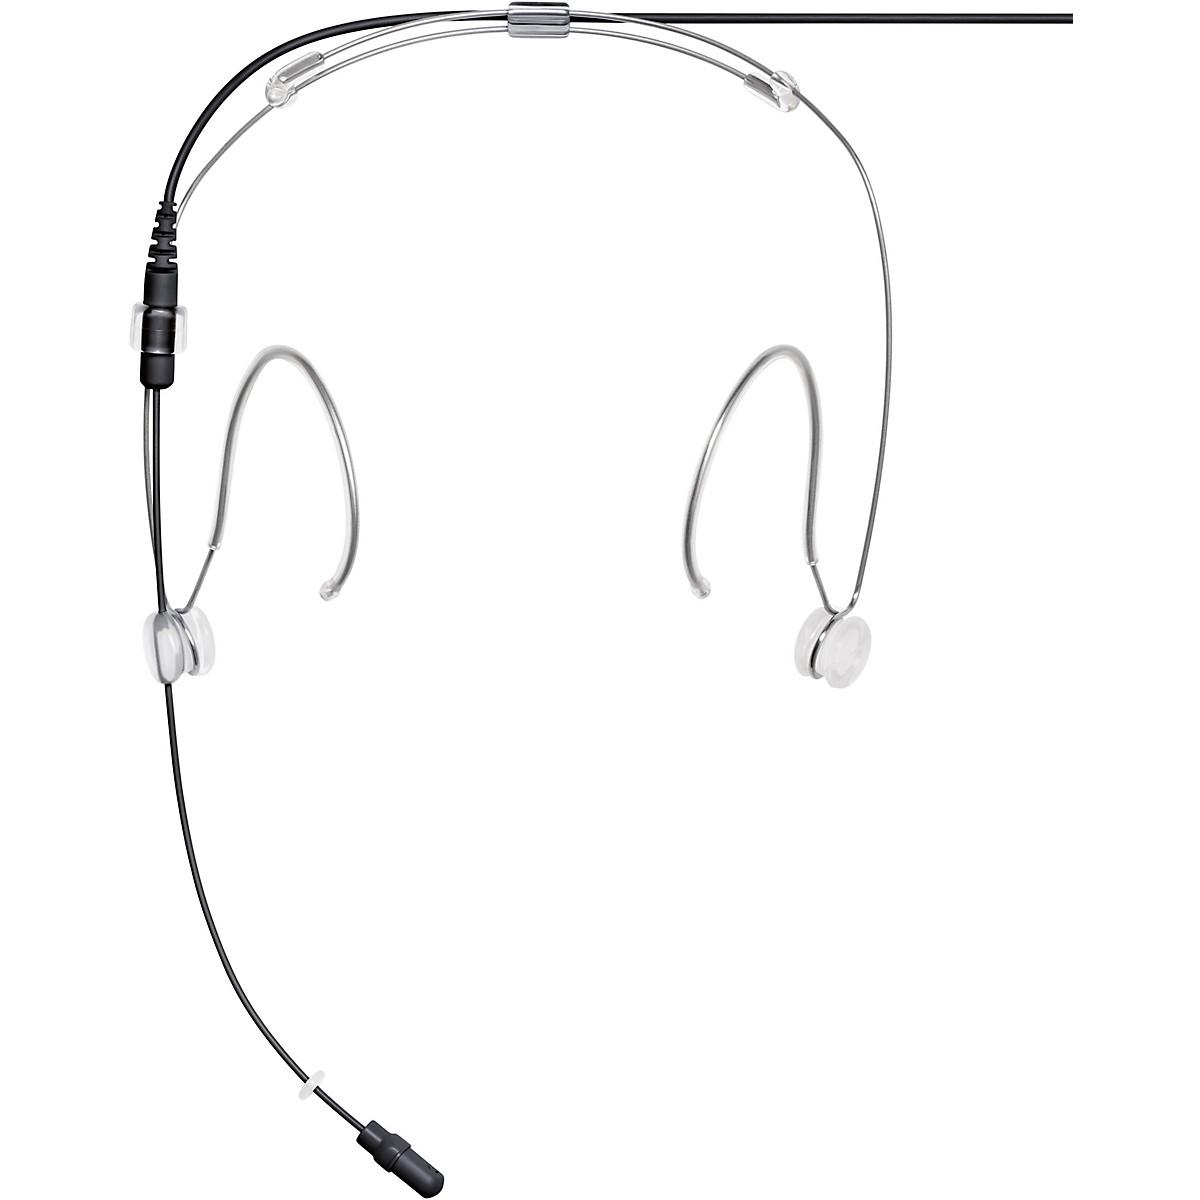 Shure DH5 DuraPlex Omnidirectional Headset Microphone (MTQG Connector)